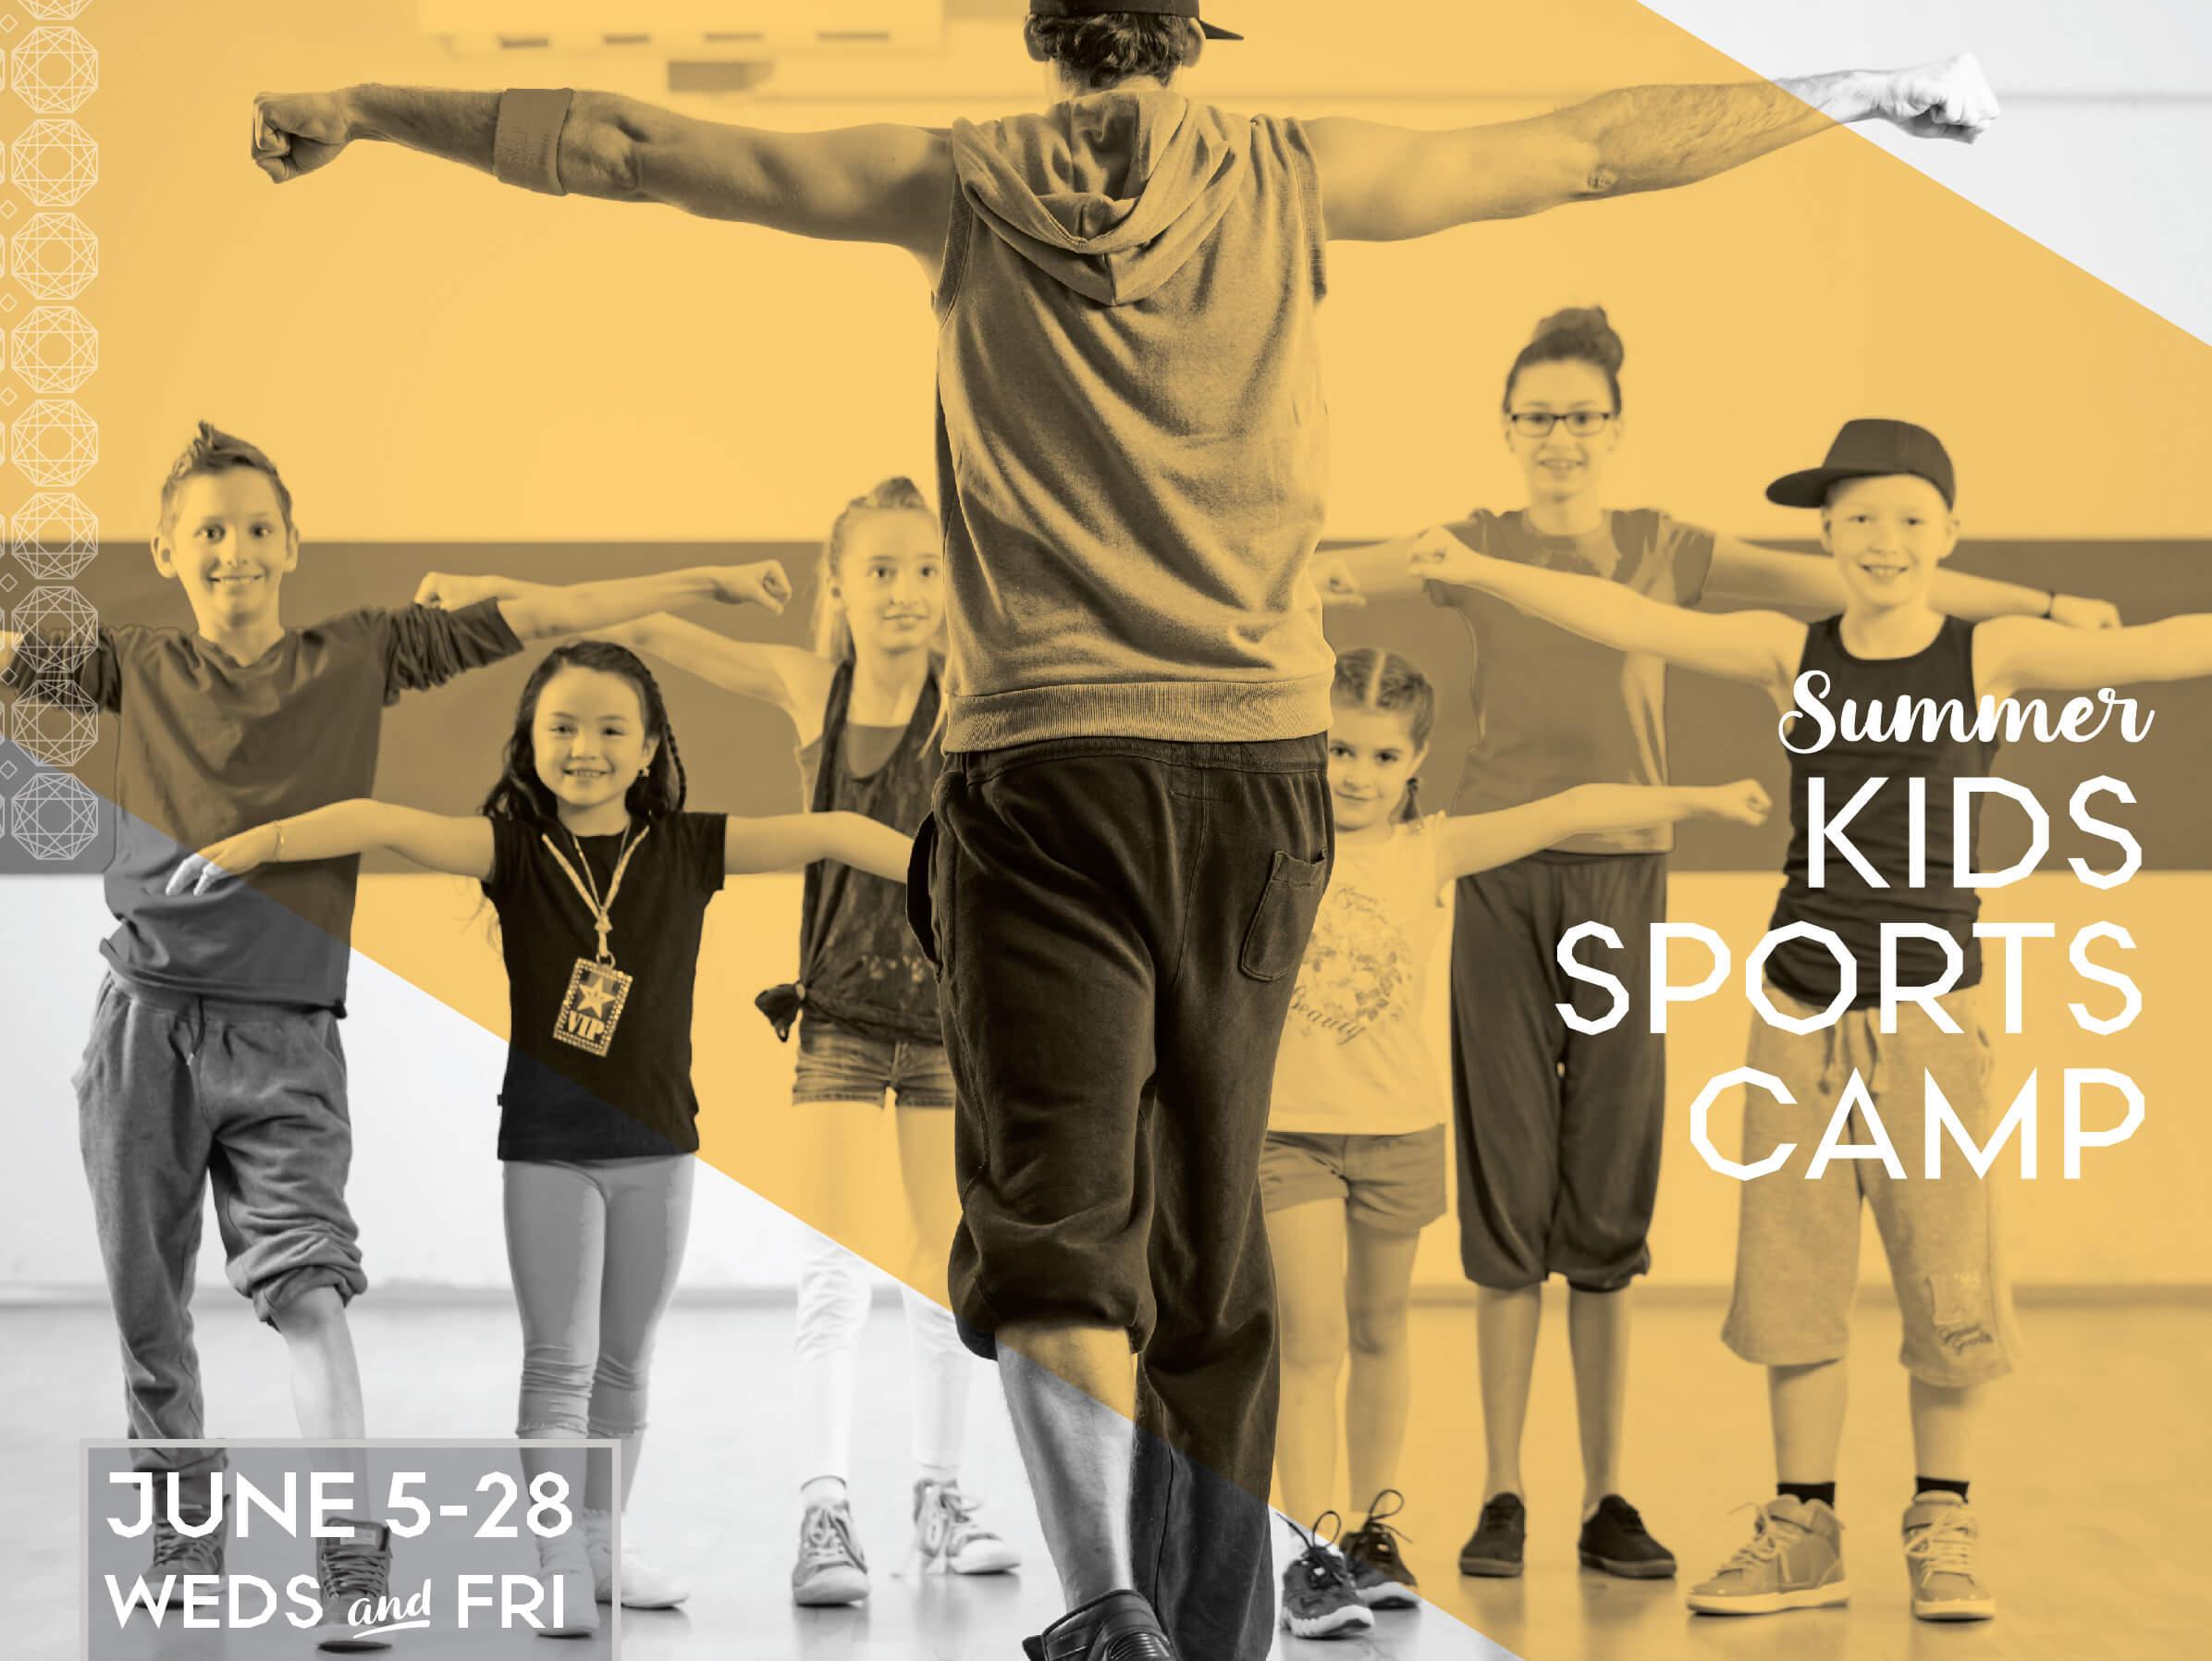 Summer Kids Sports Camp